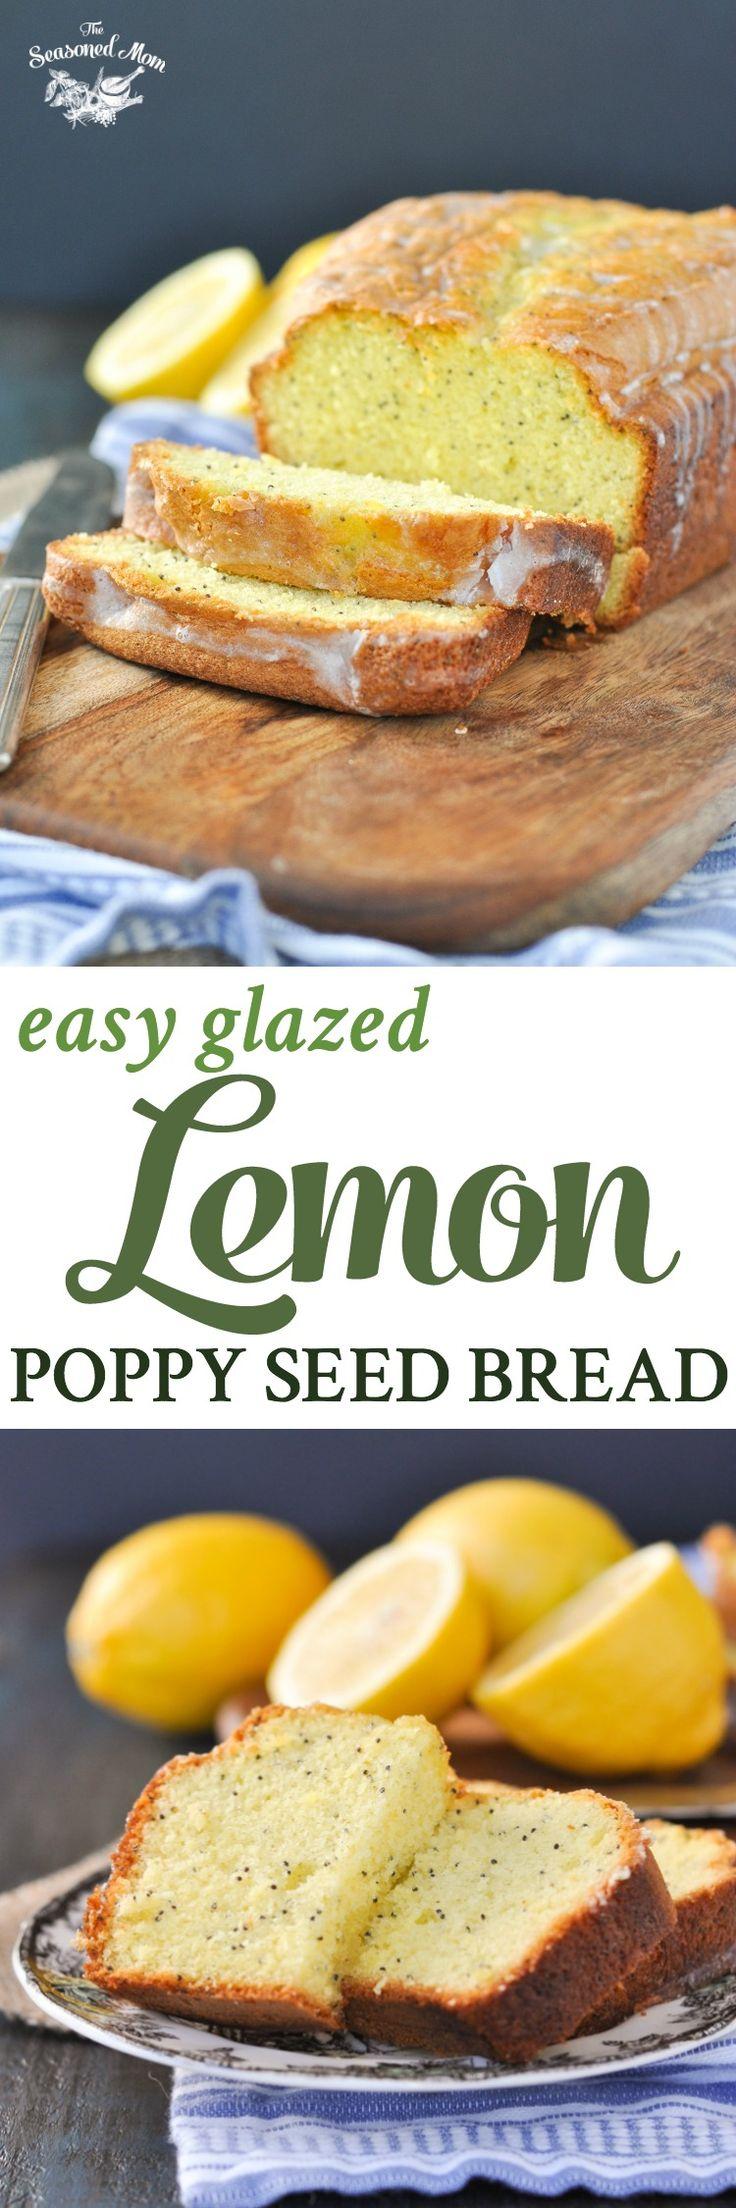 Easy Glazed Lemon Poppy Seed Bread   Lemon Desserts   Lemon Cake   Brunch Ideas   Brunch Recipes   Breakfast   Bread Recipes